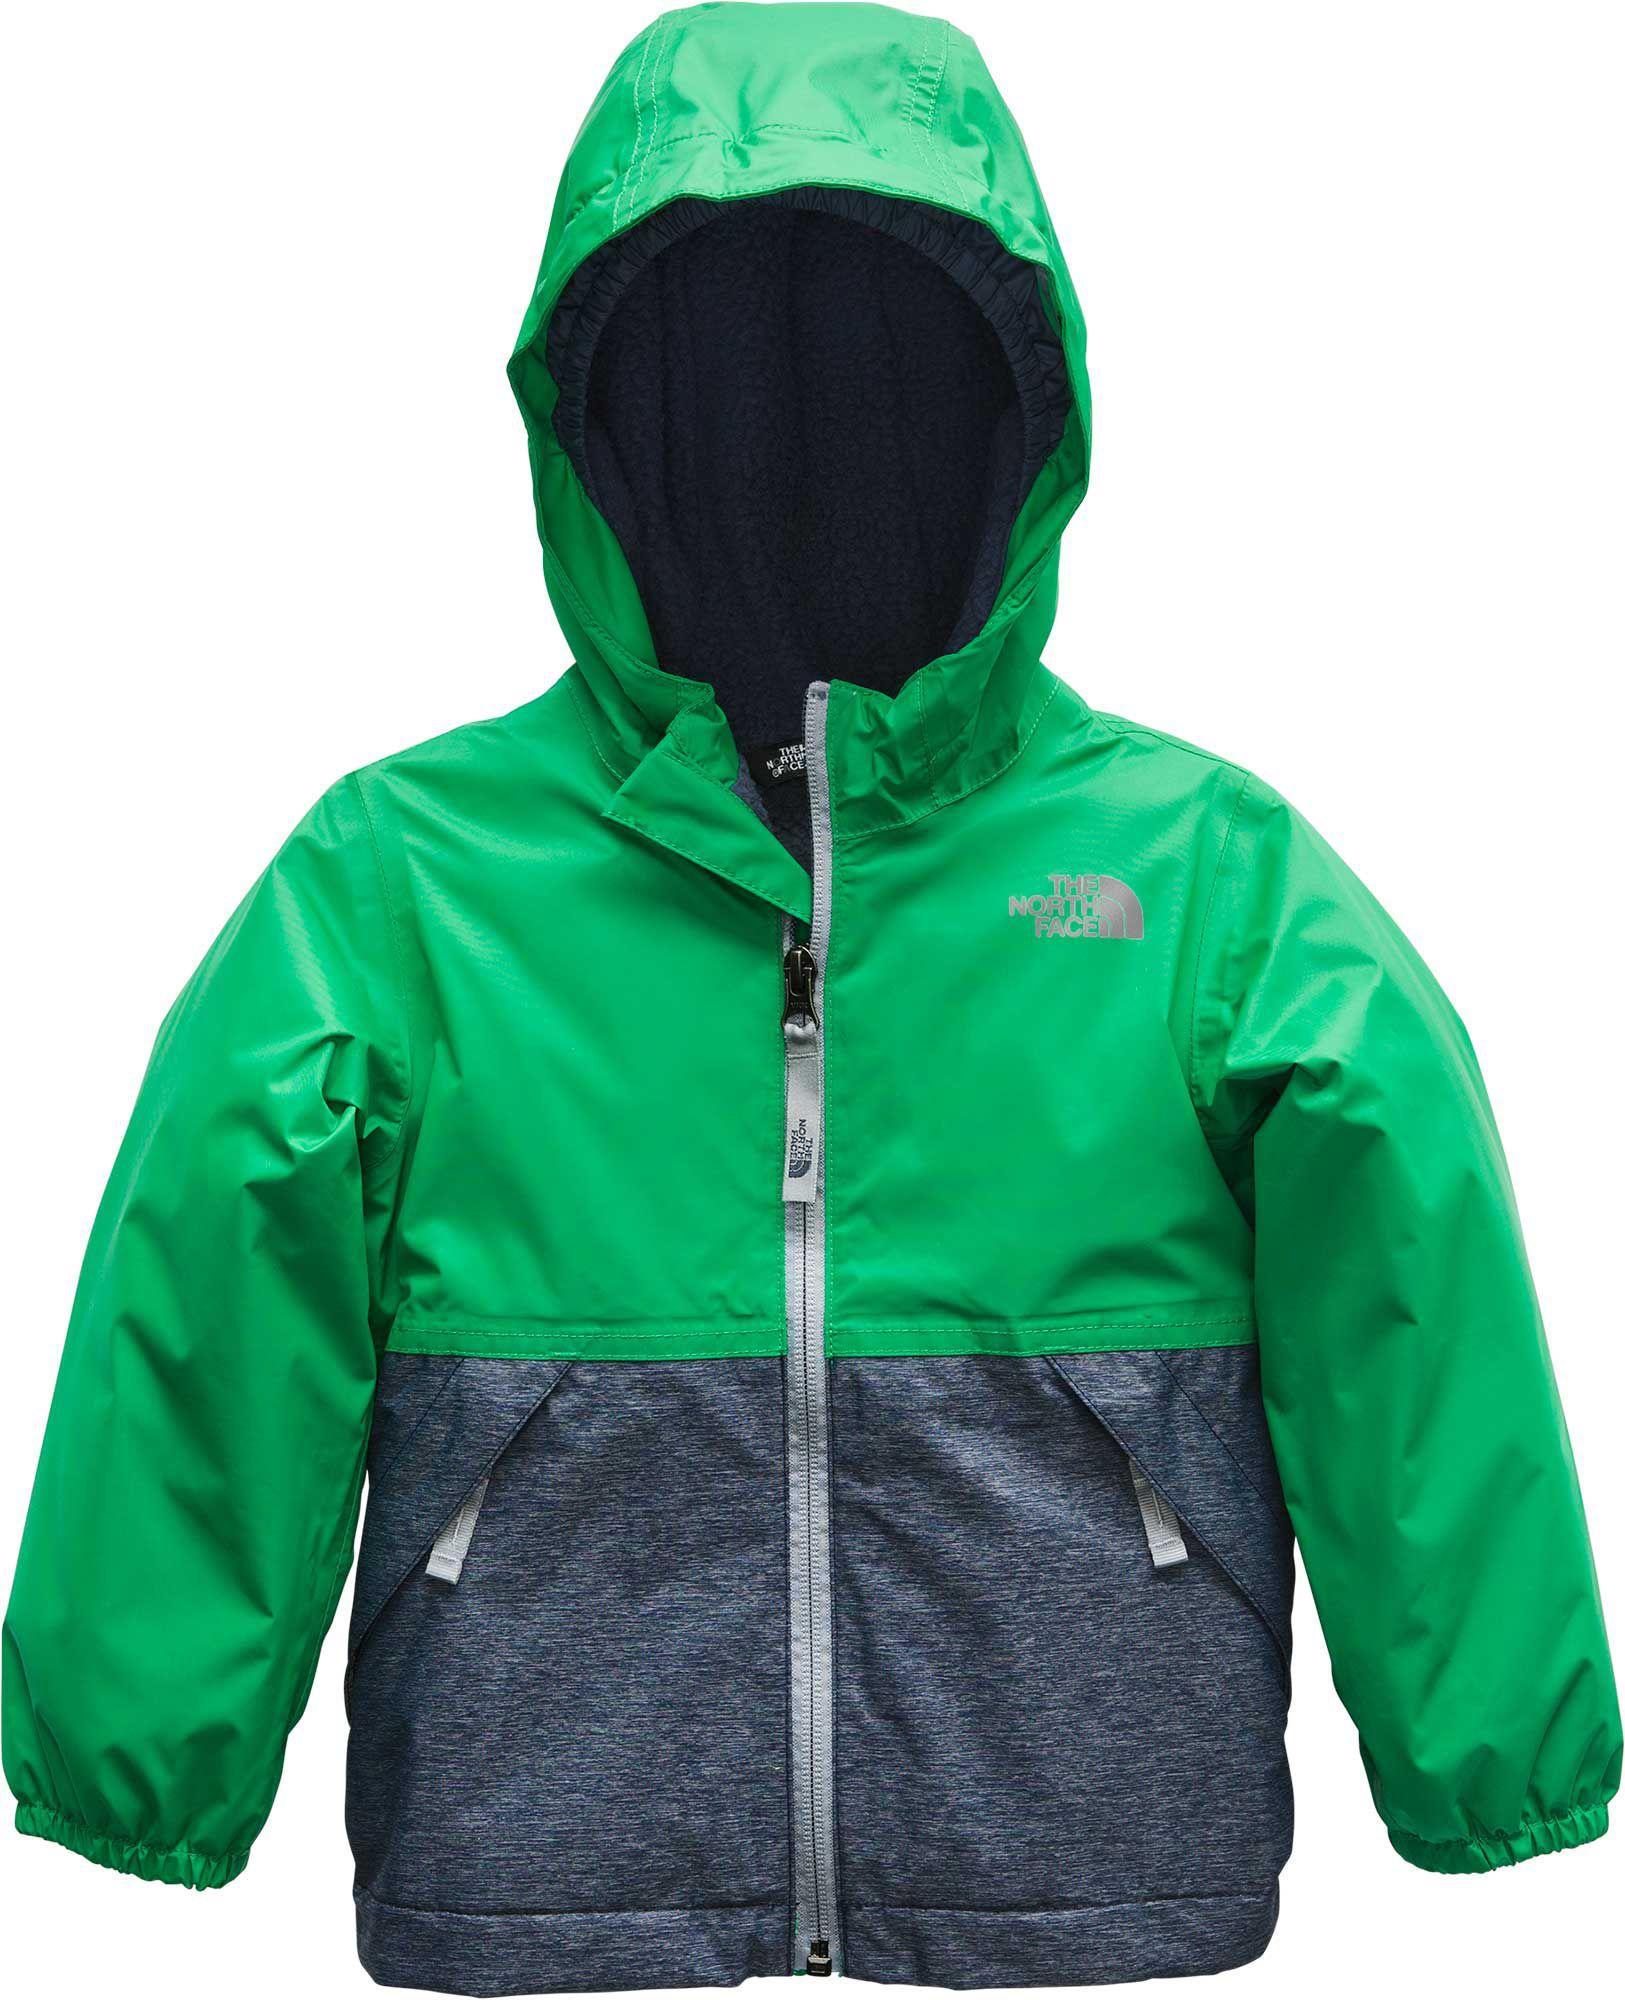 39e67e846b00 The North Face Toddler Boys  Warm Storm Rain Jacket